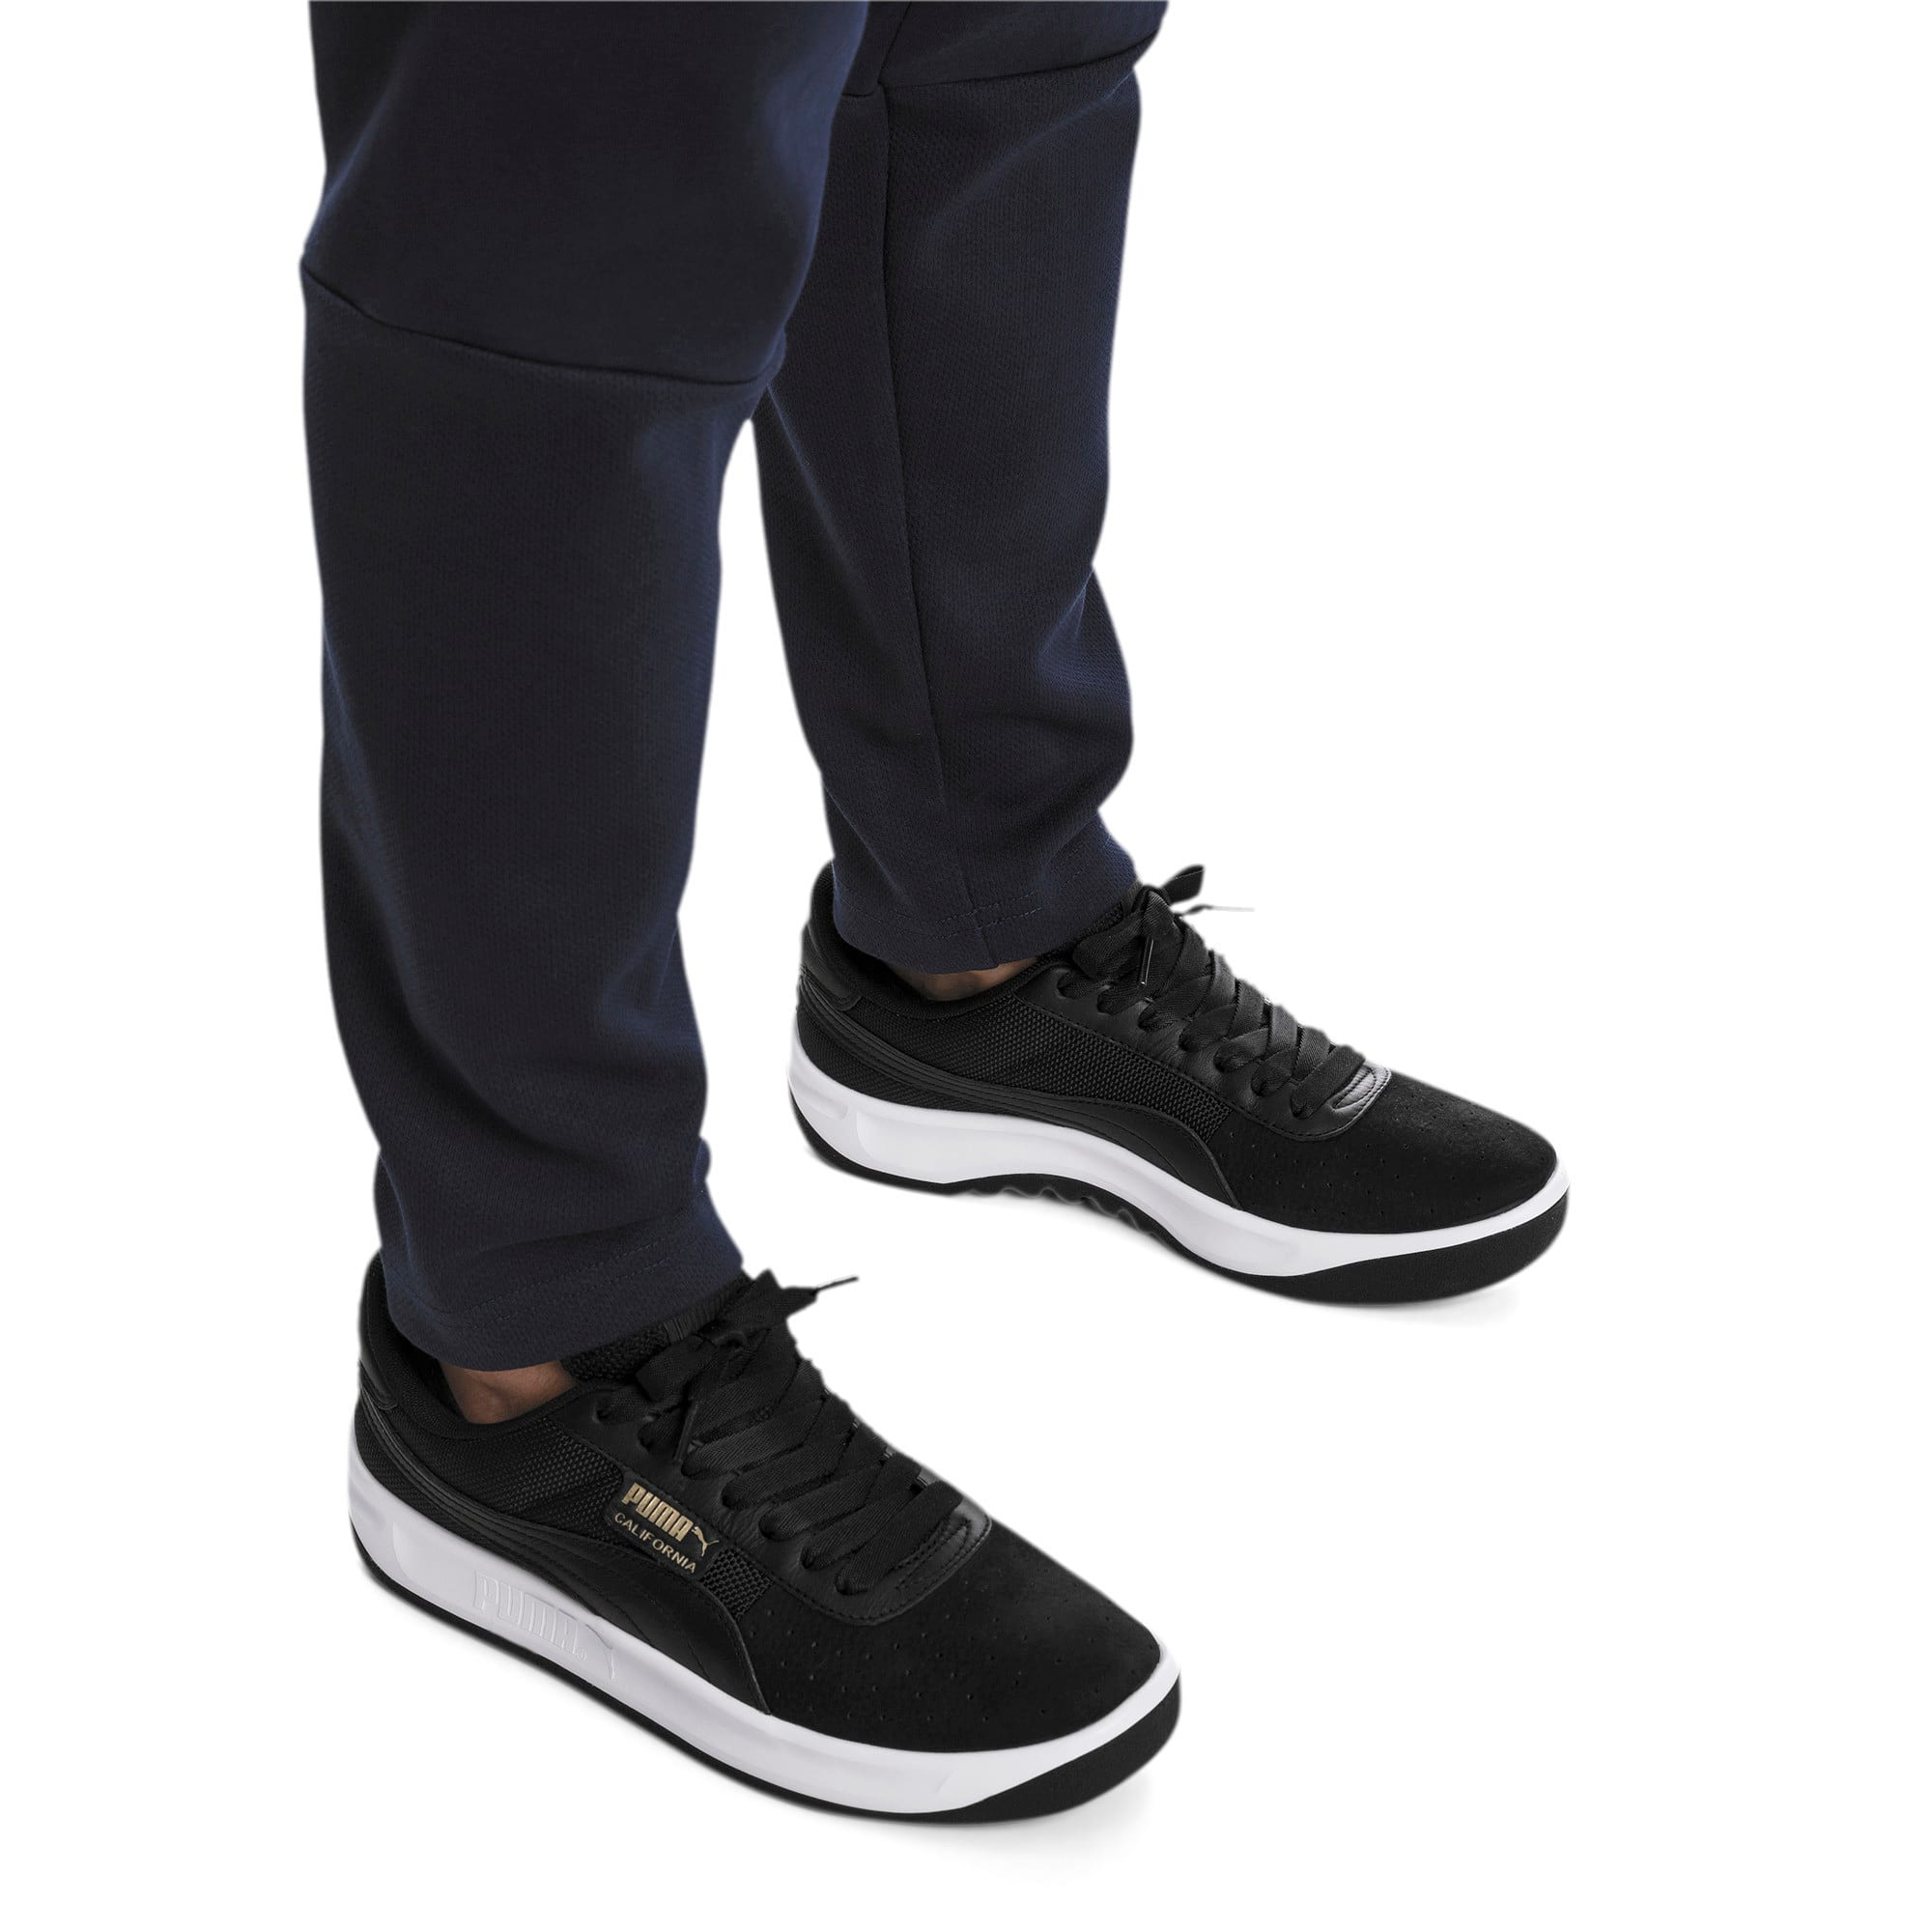 Miniatura 2 de Zapatos deportivos California, P Black-P White-P Black, mediano